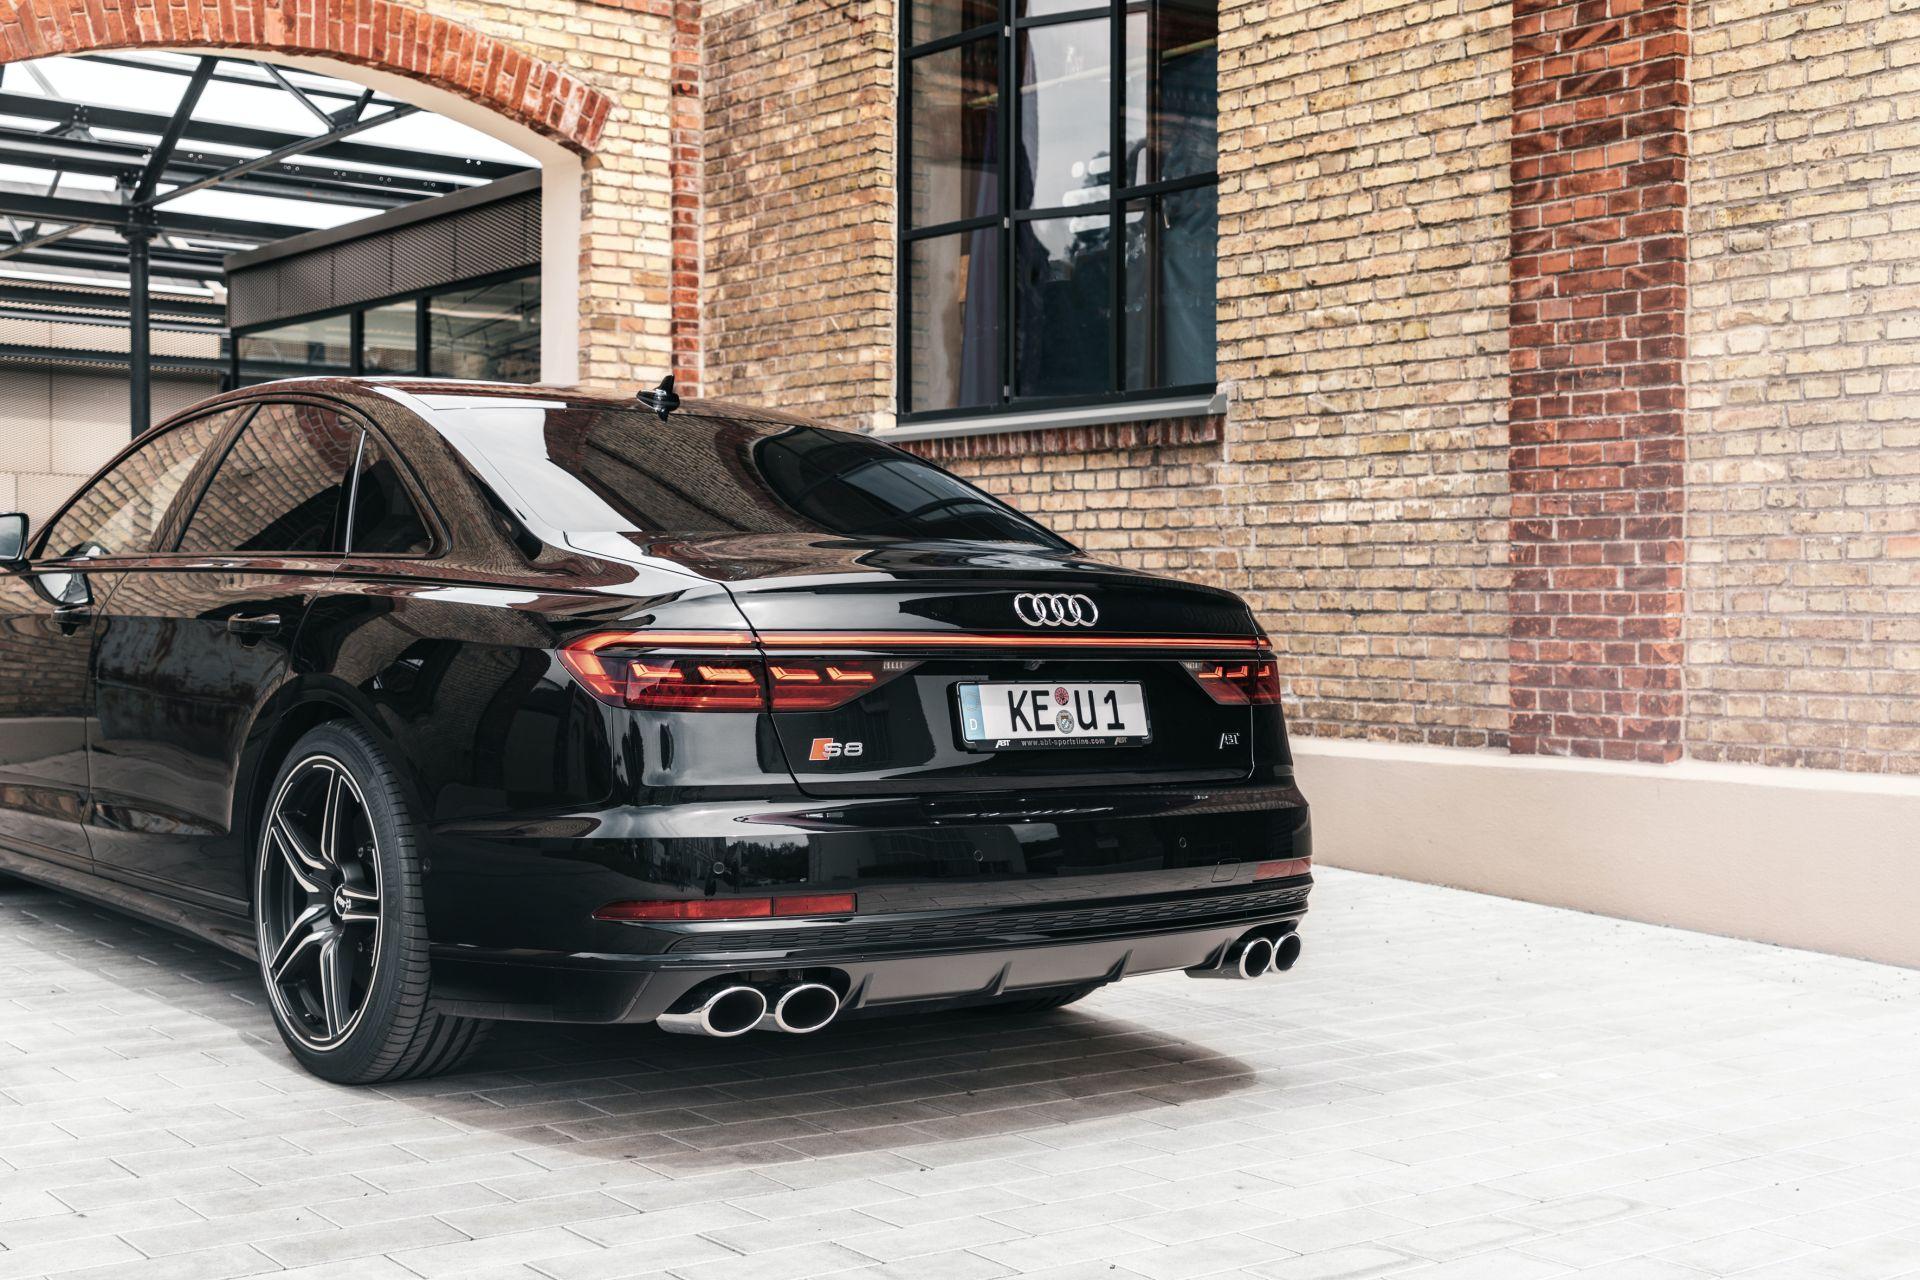 Audi-S8-by-ABT-Sportsline-1-4